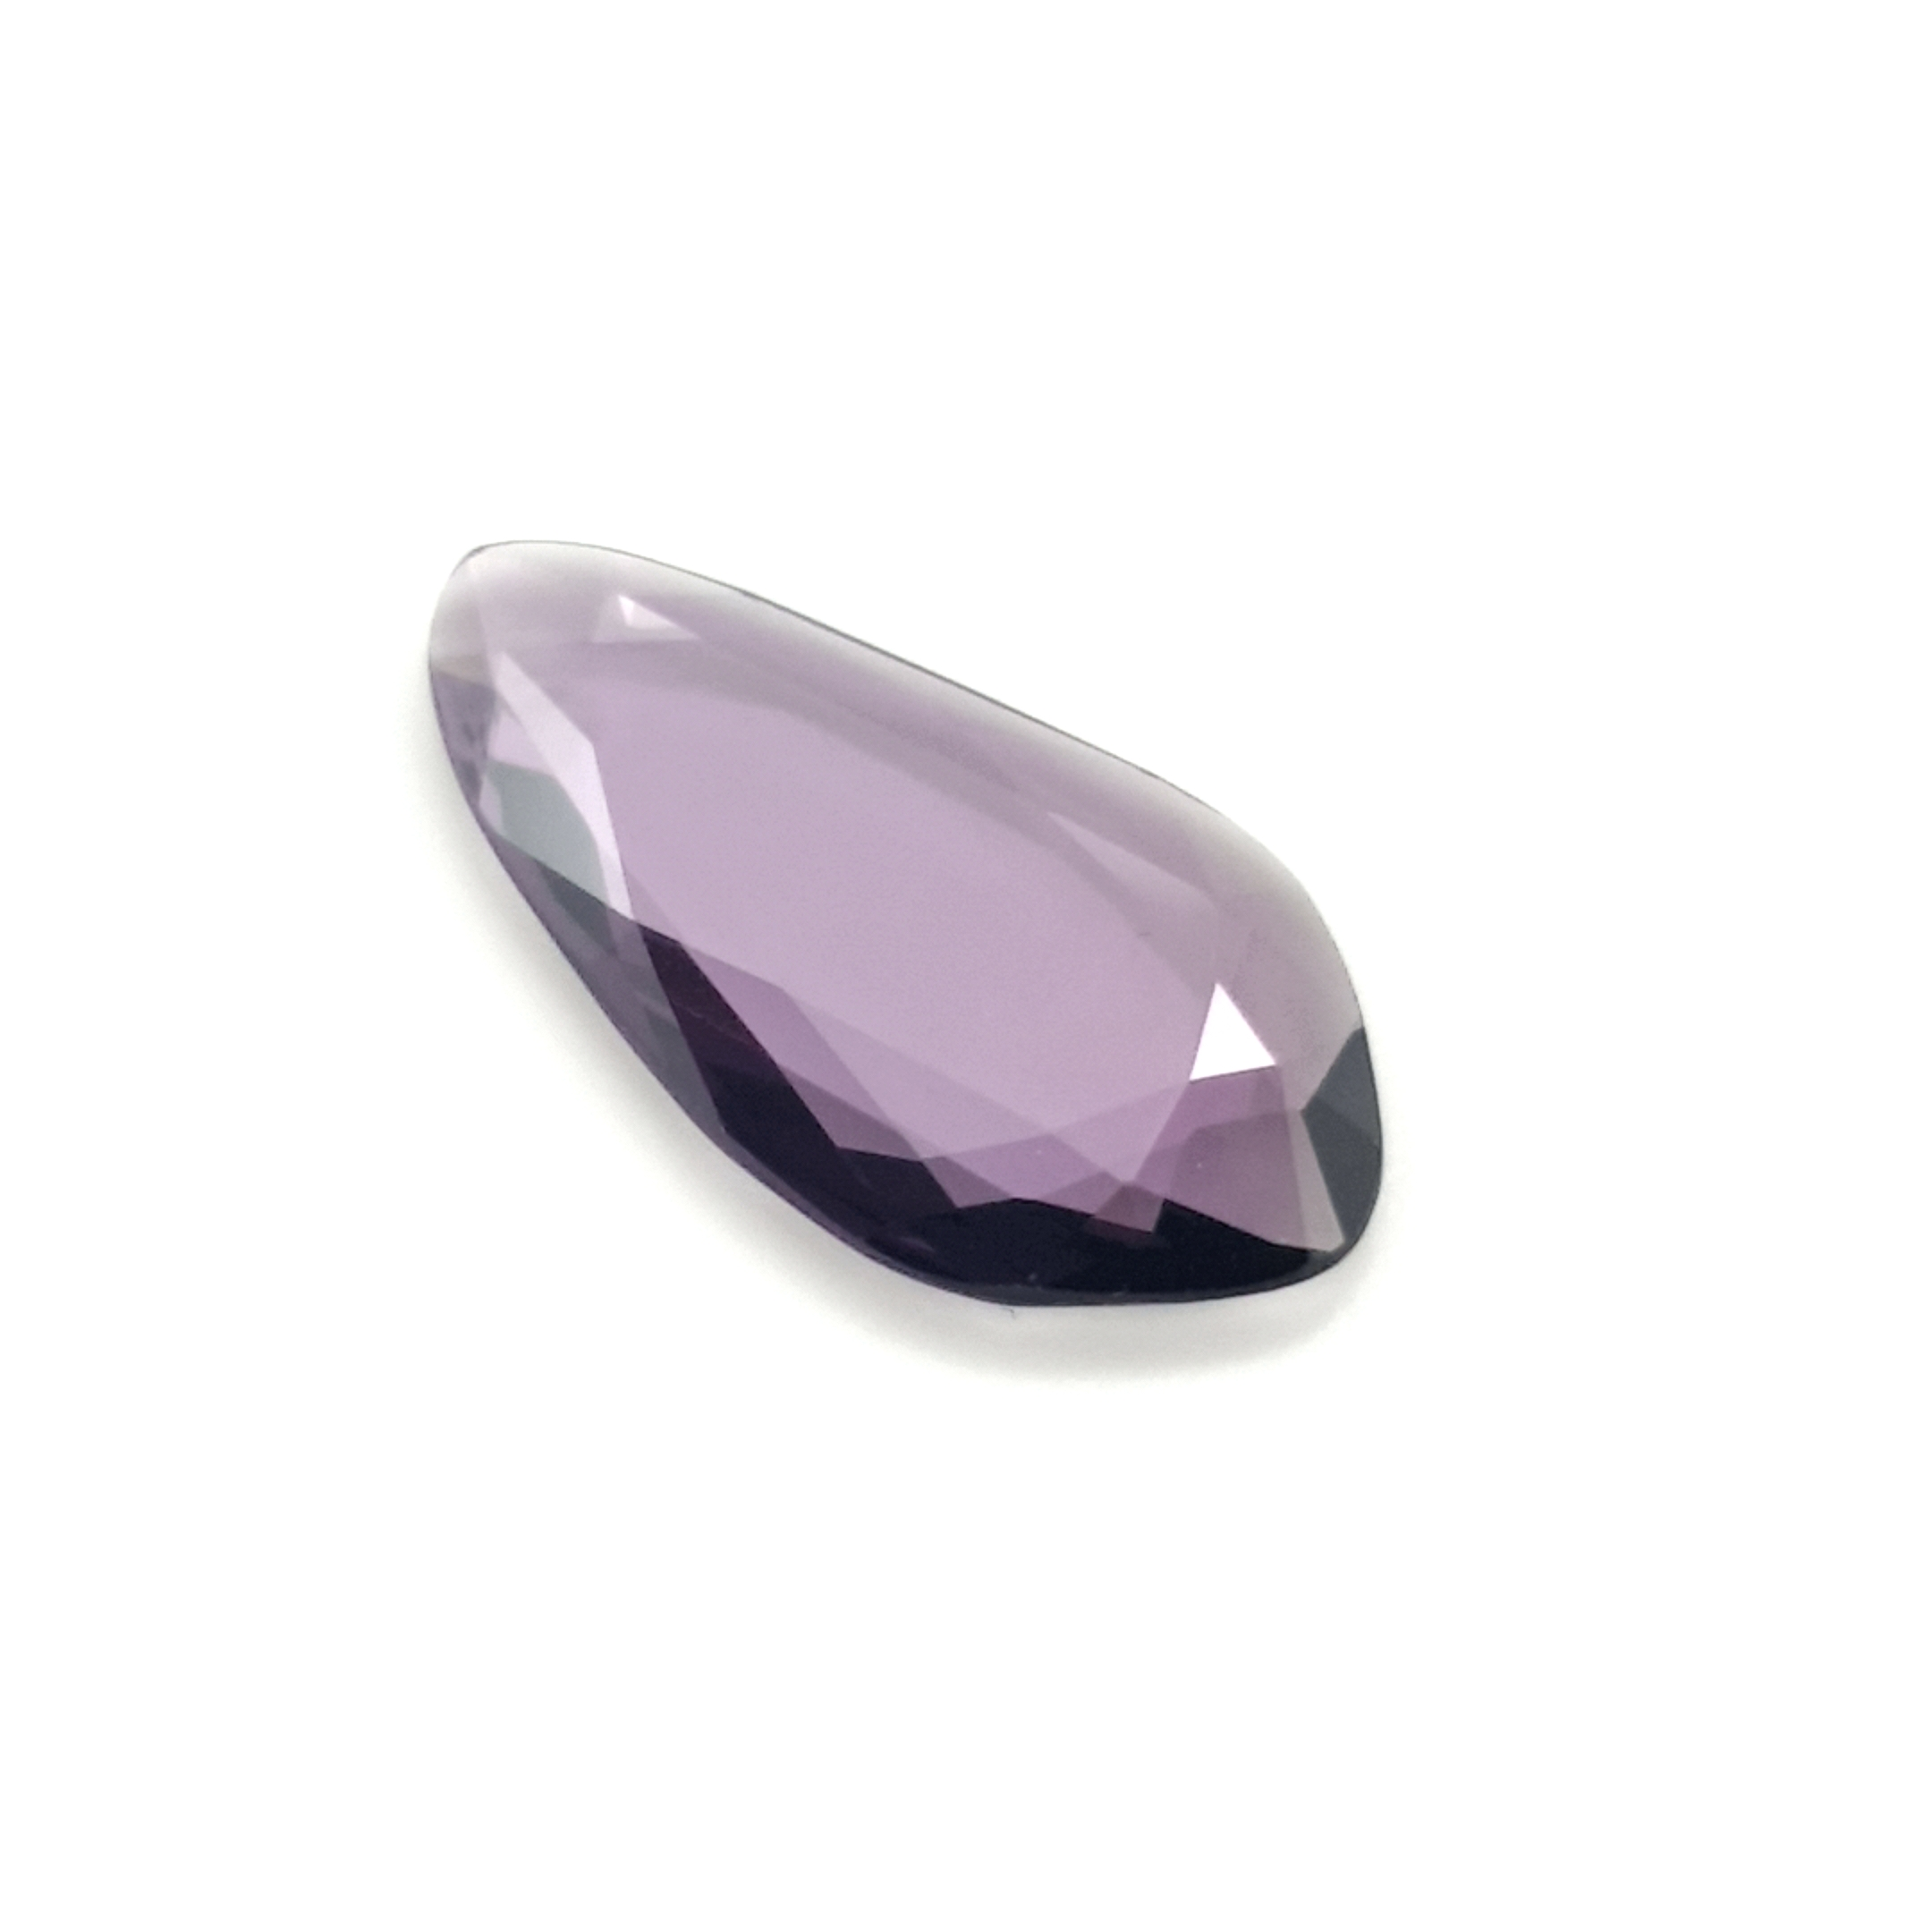 7,28ct. Violet Spinel DoubleRoseCut SNK14C51 ClaudiaHamann__2021-02-15-18-23-58